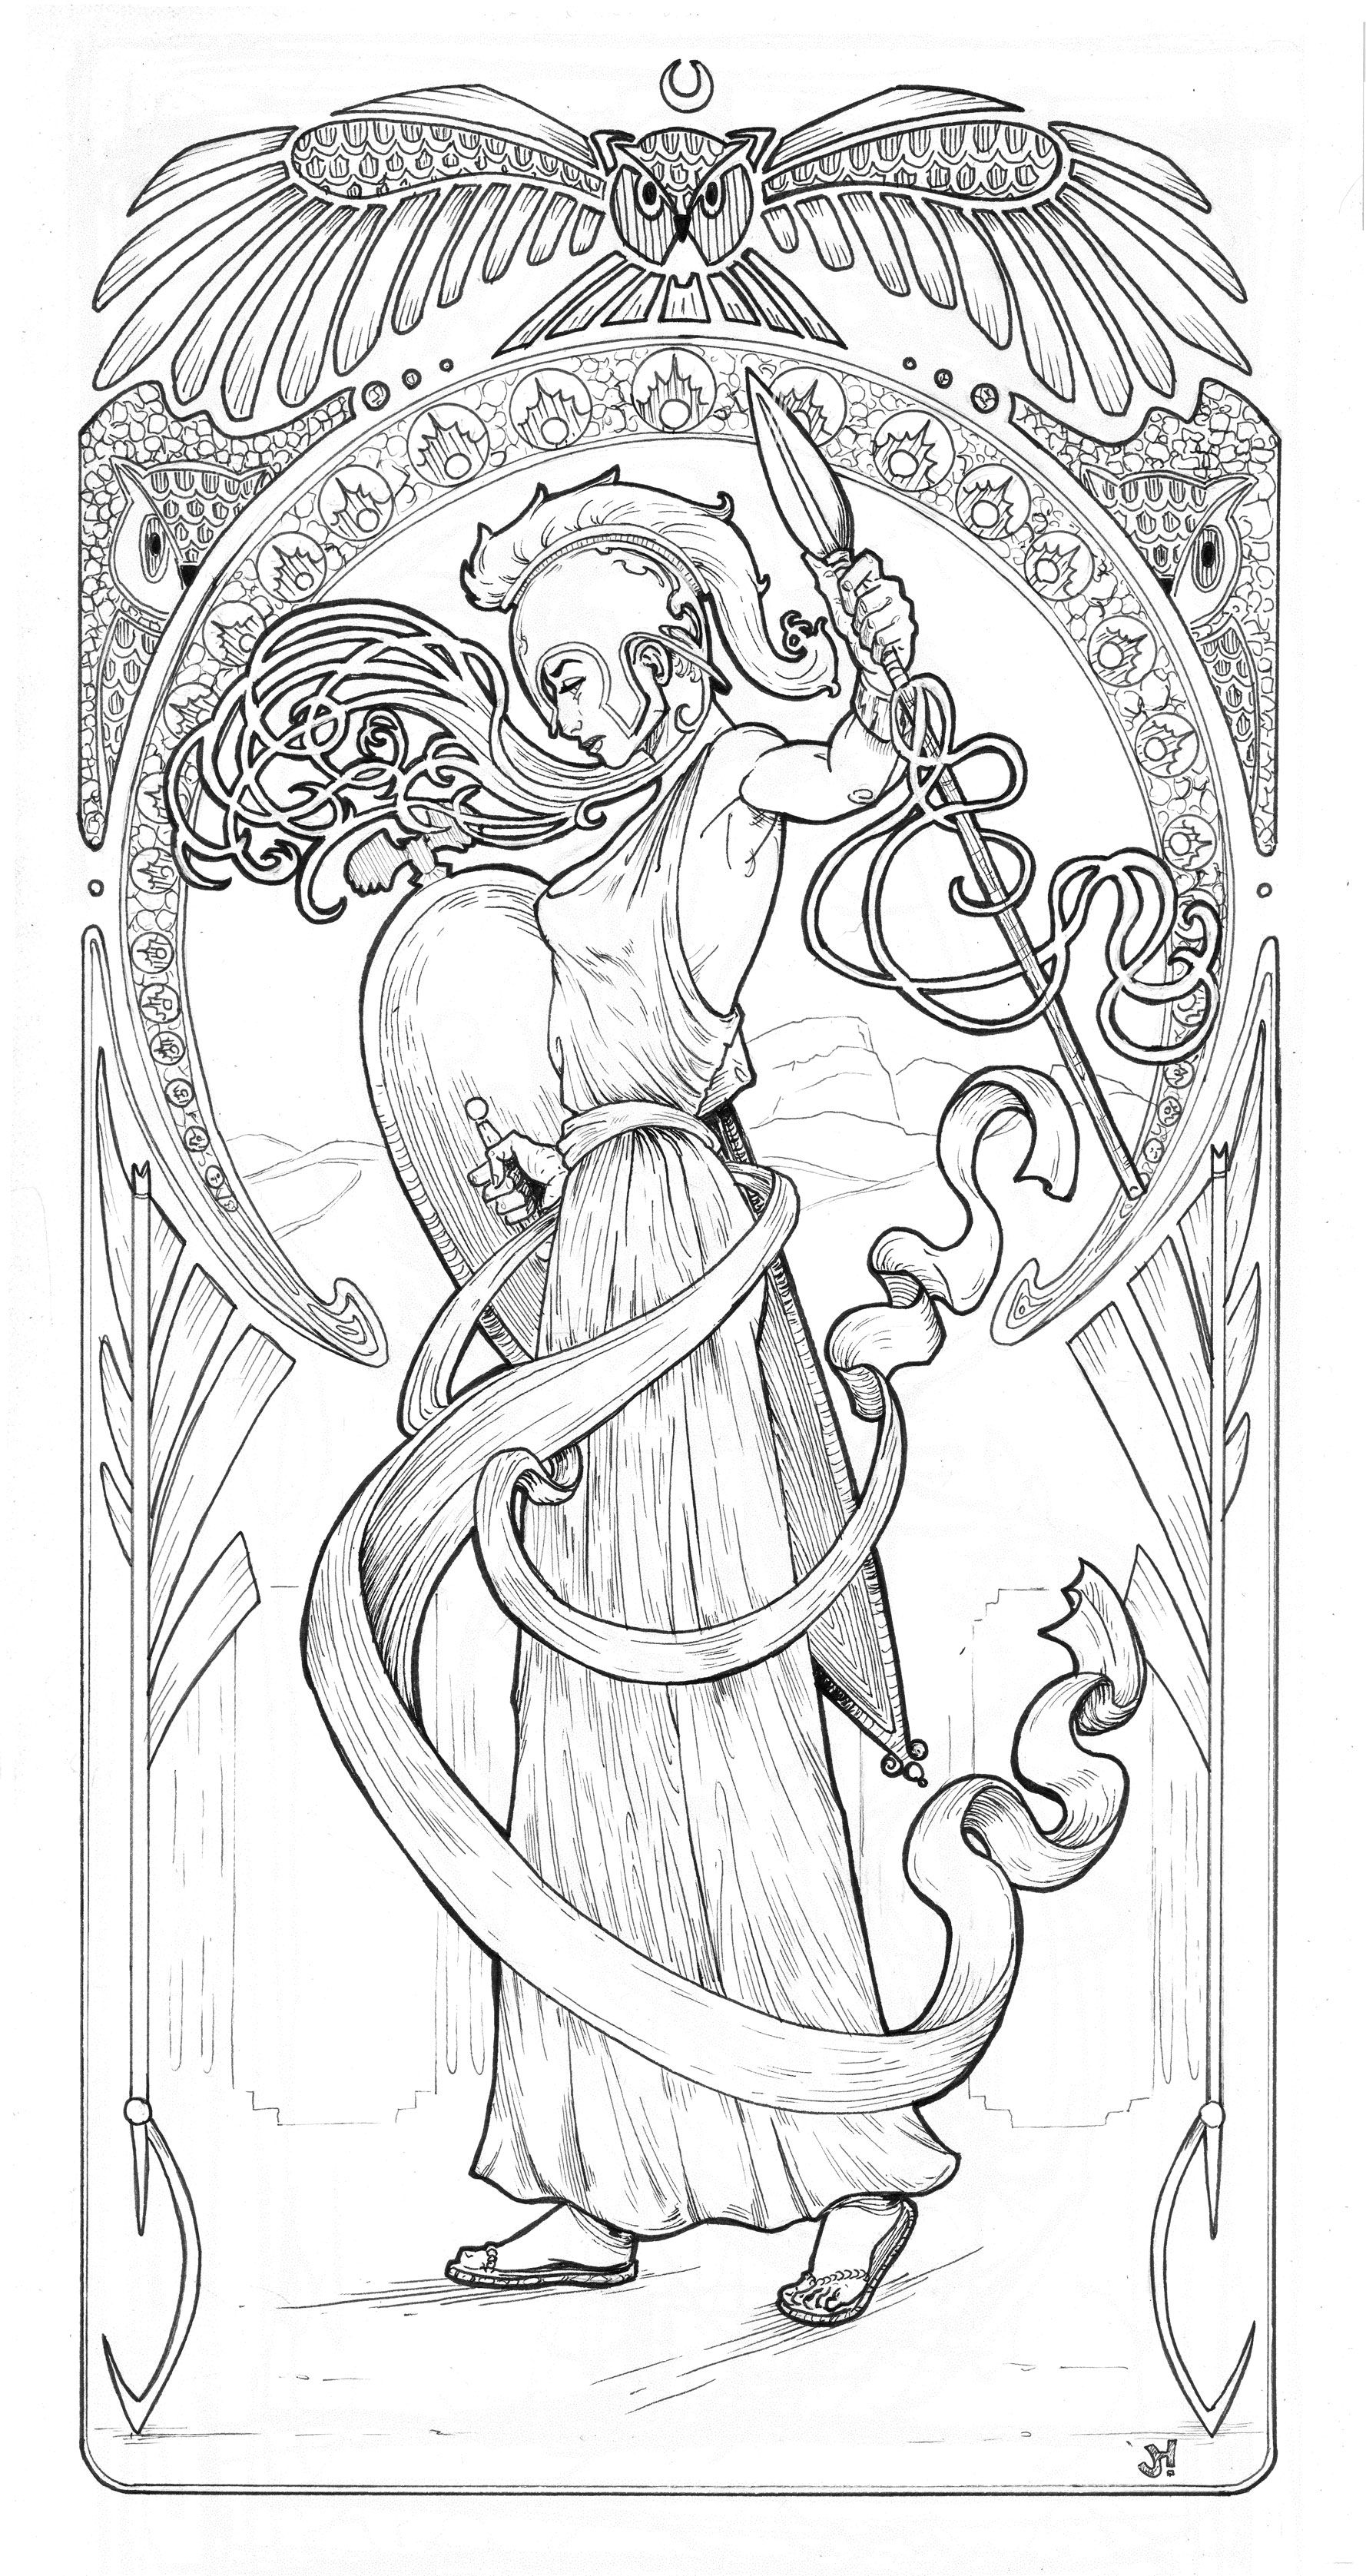 Pin de Sean Chew en Things to Wear | Pinterest | Mitología, Tatuajes ...